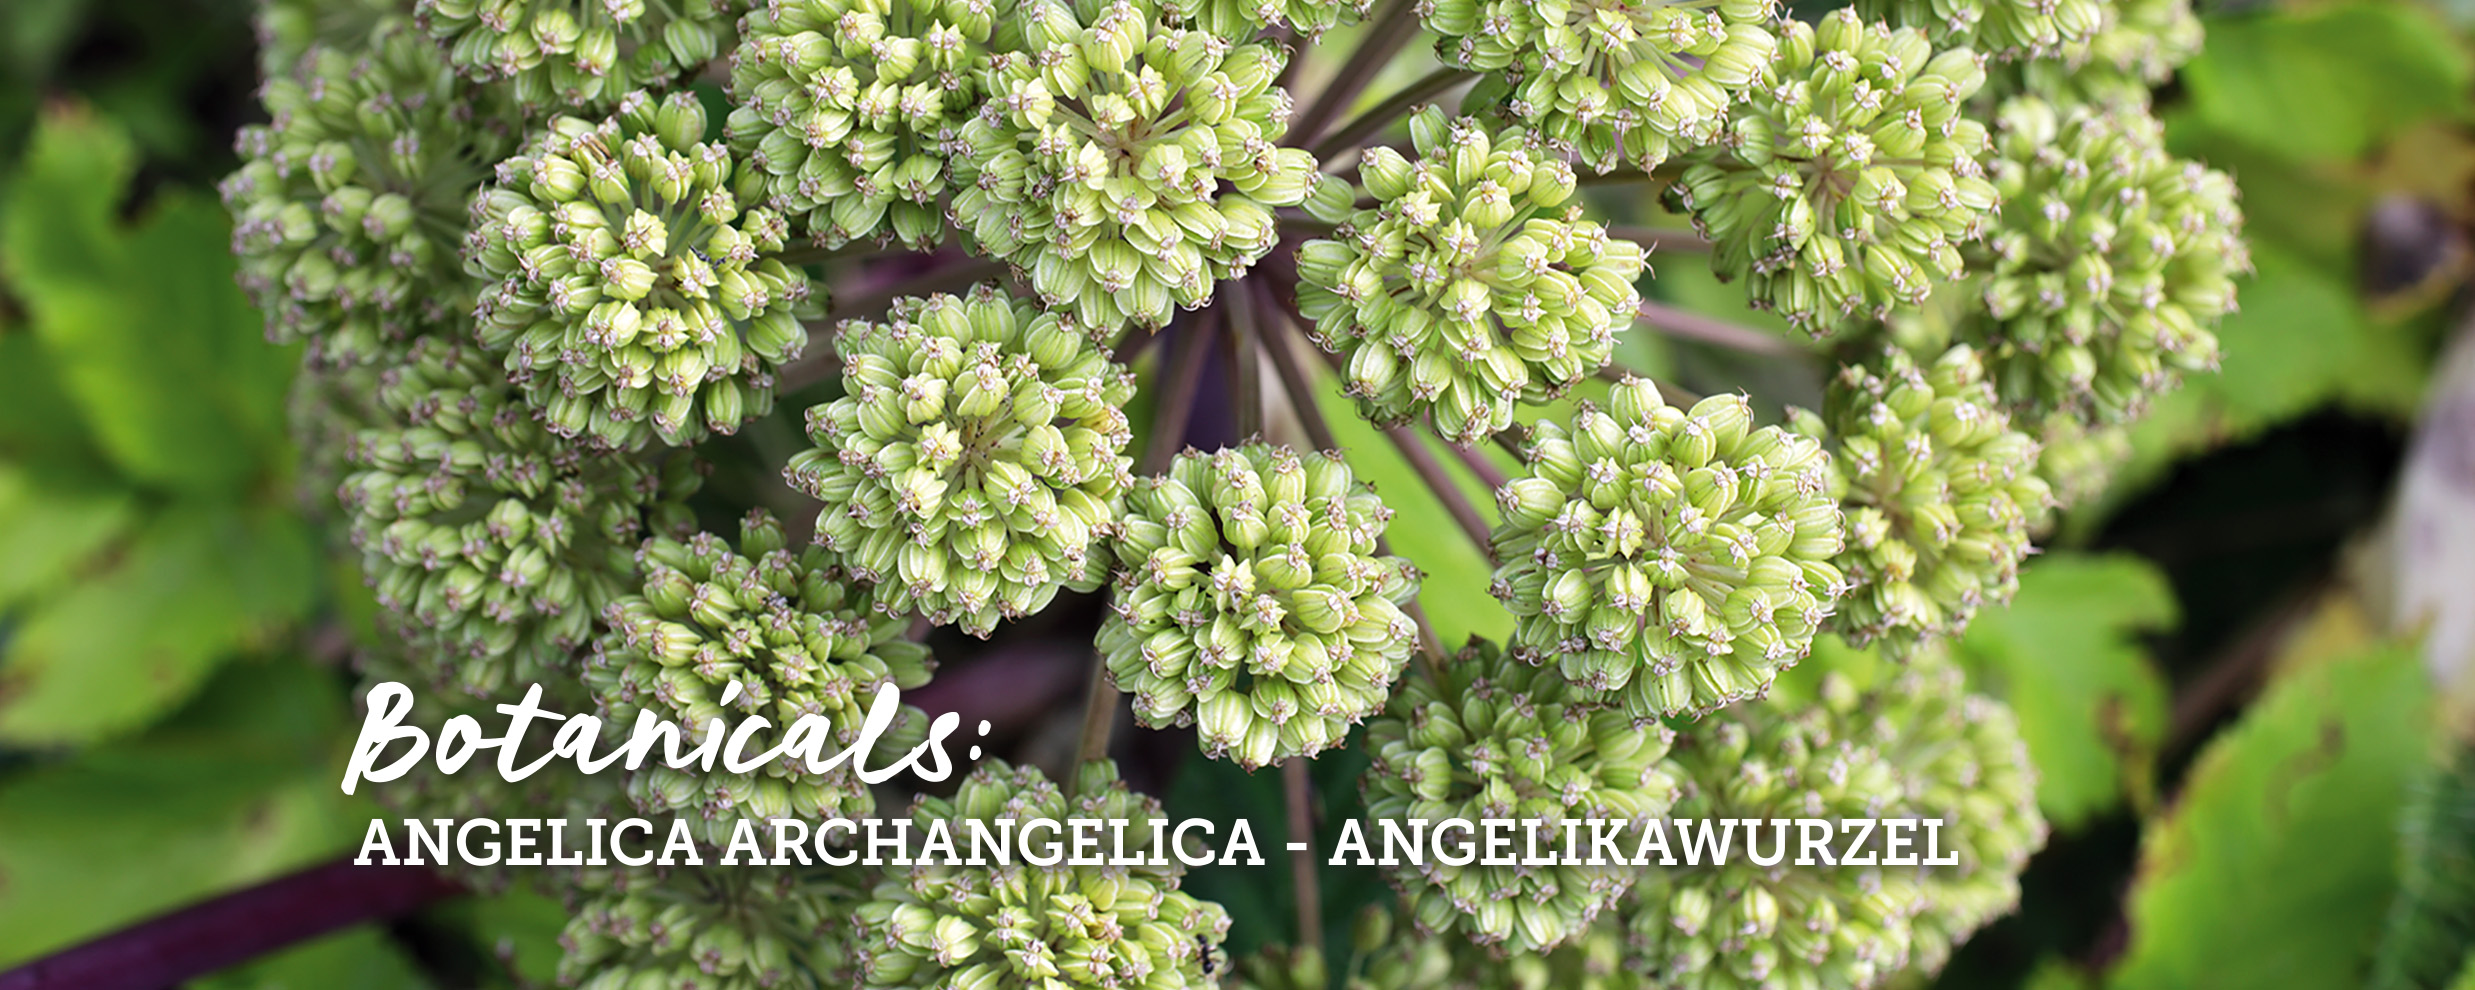 botanicals-angelikawurzel